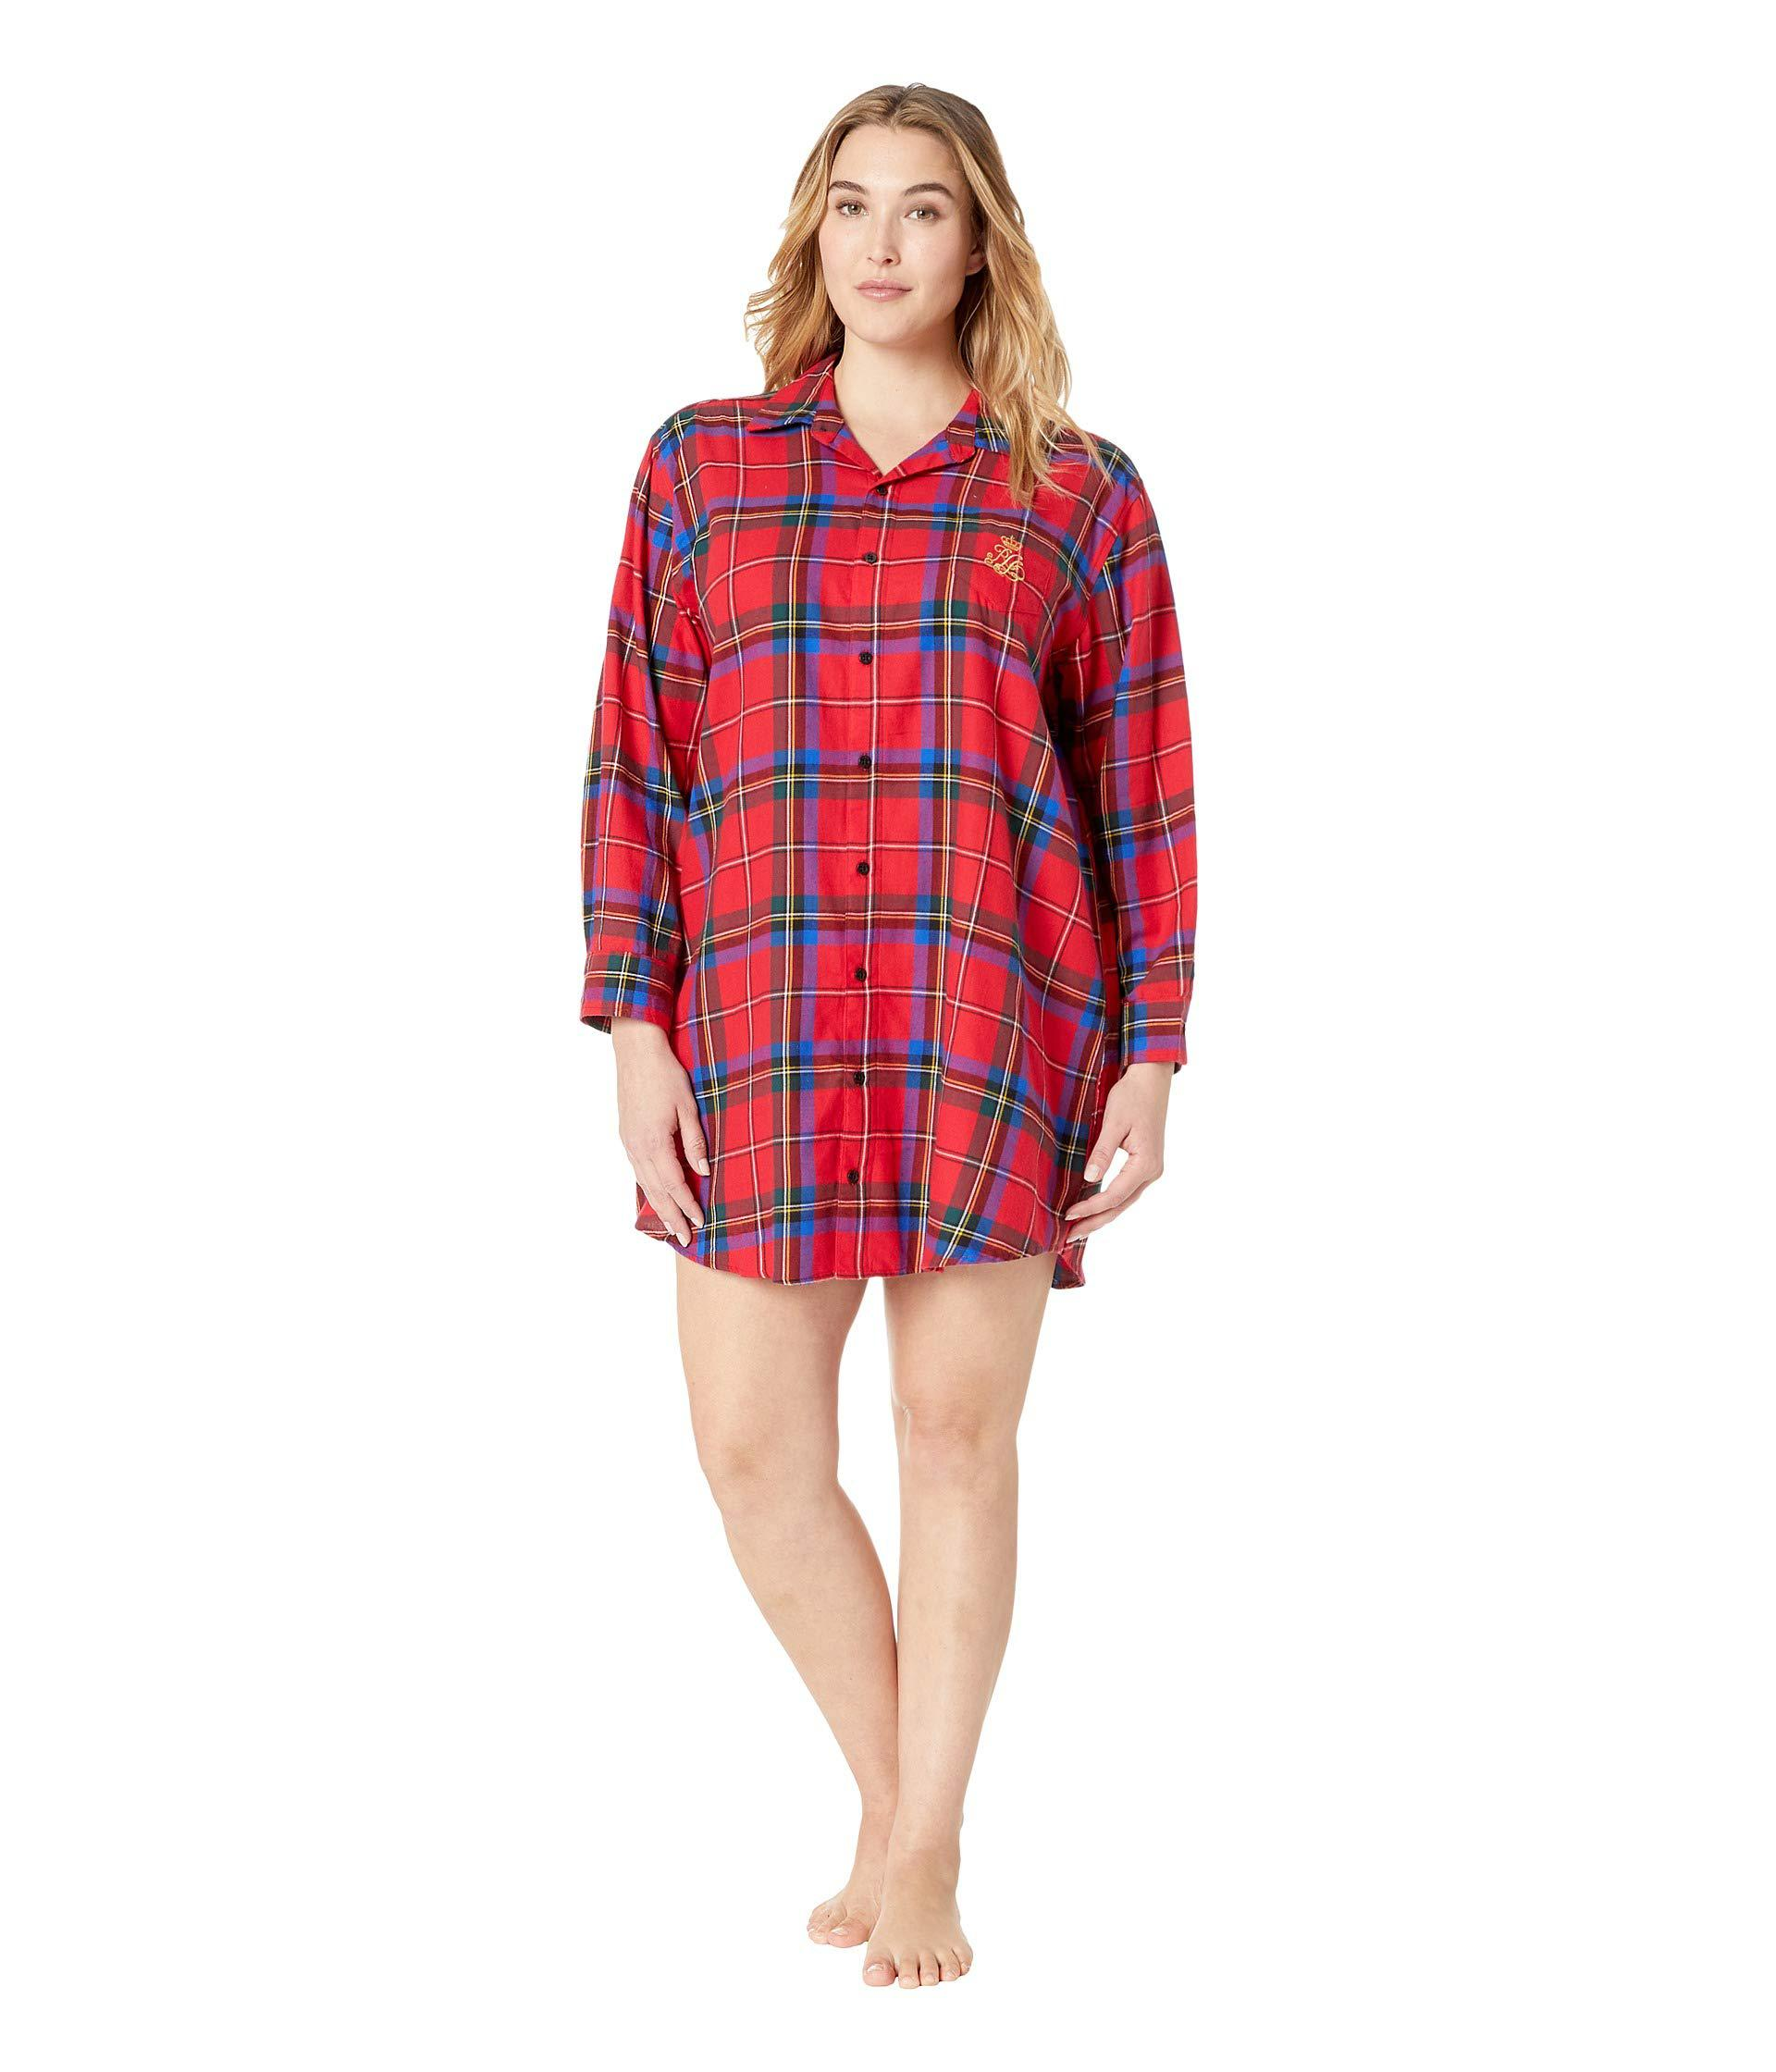 Lyst - Lauren by Ralph Lauren Plus Size Brushed Twill His Shirt ... 9aefd4b8b